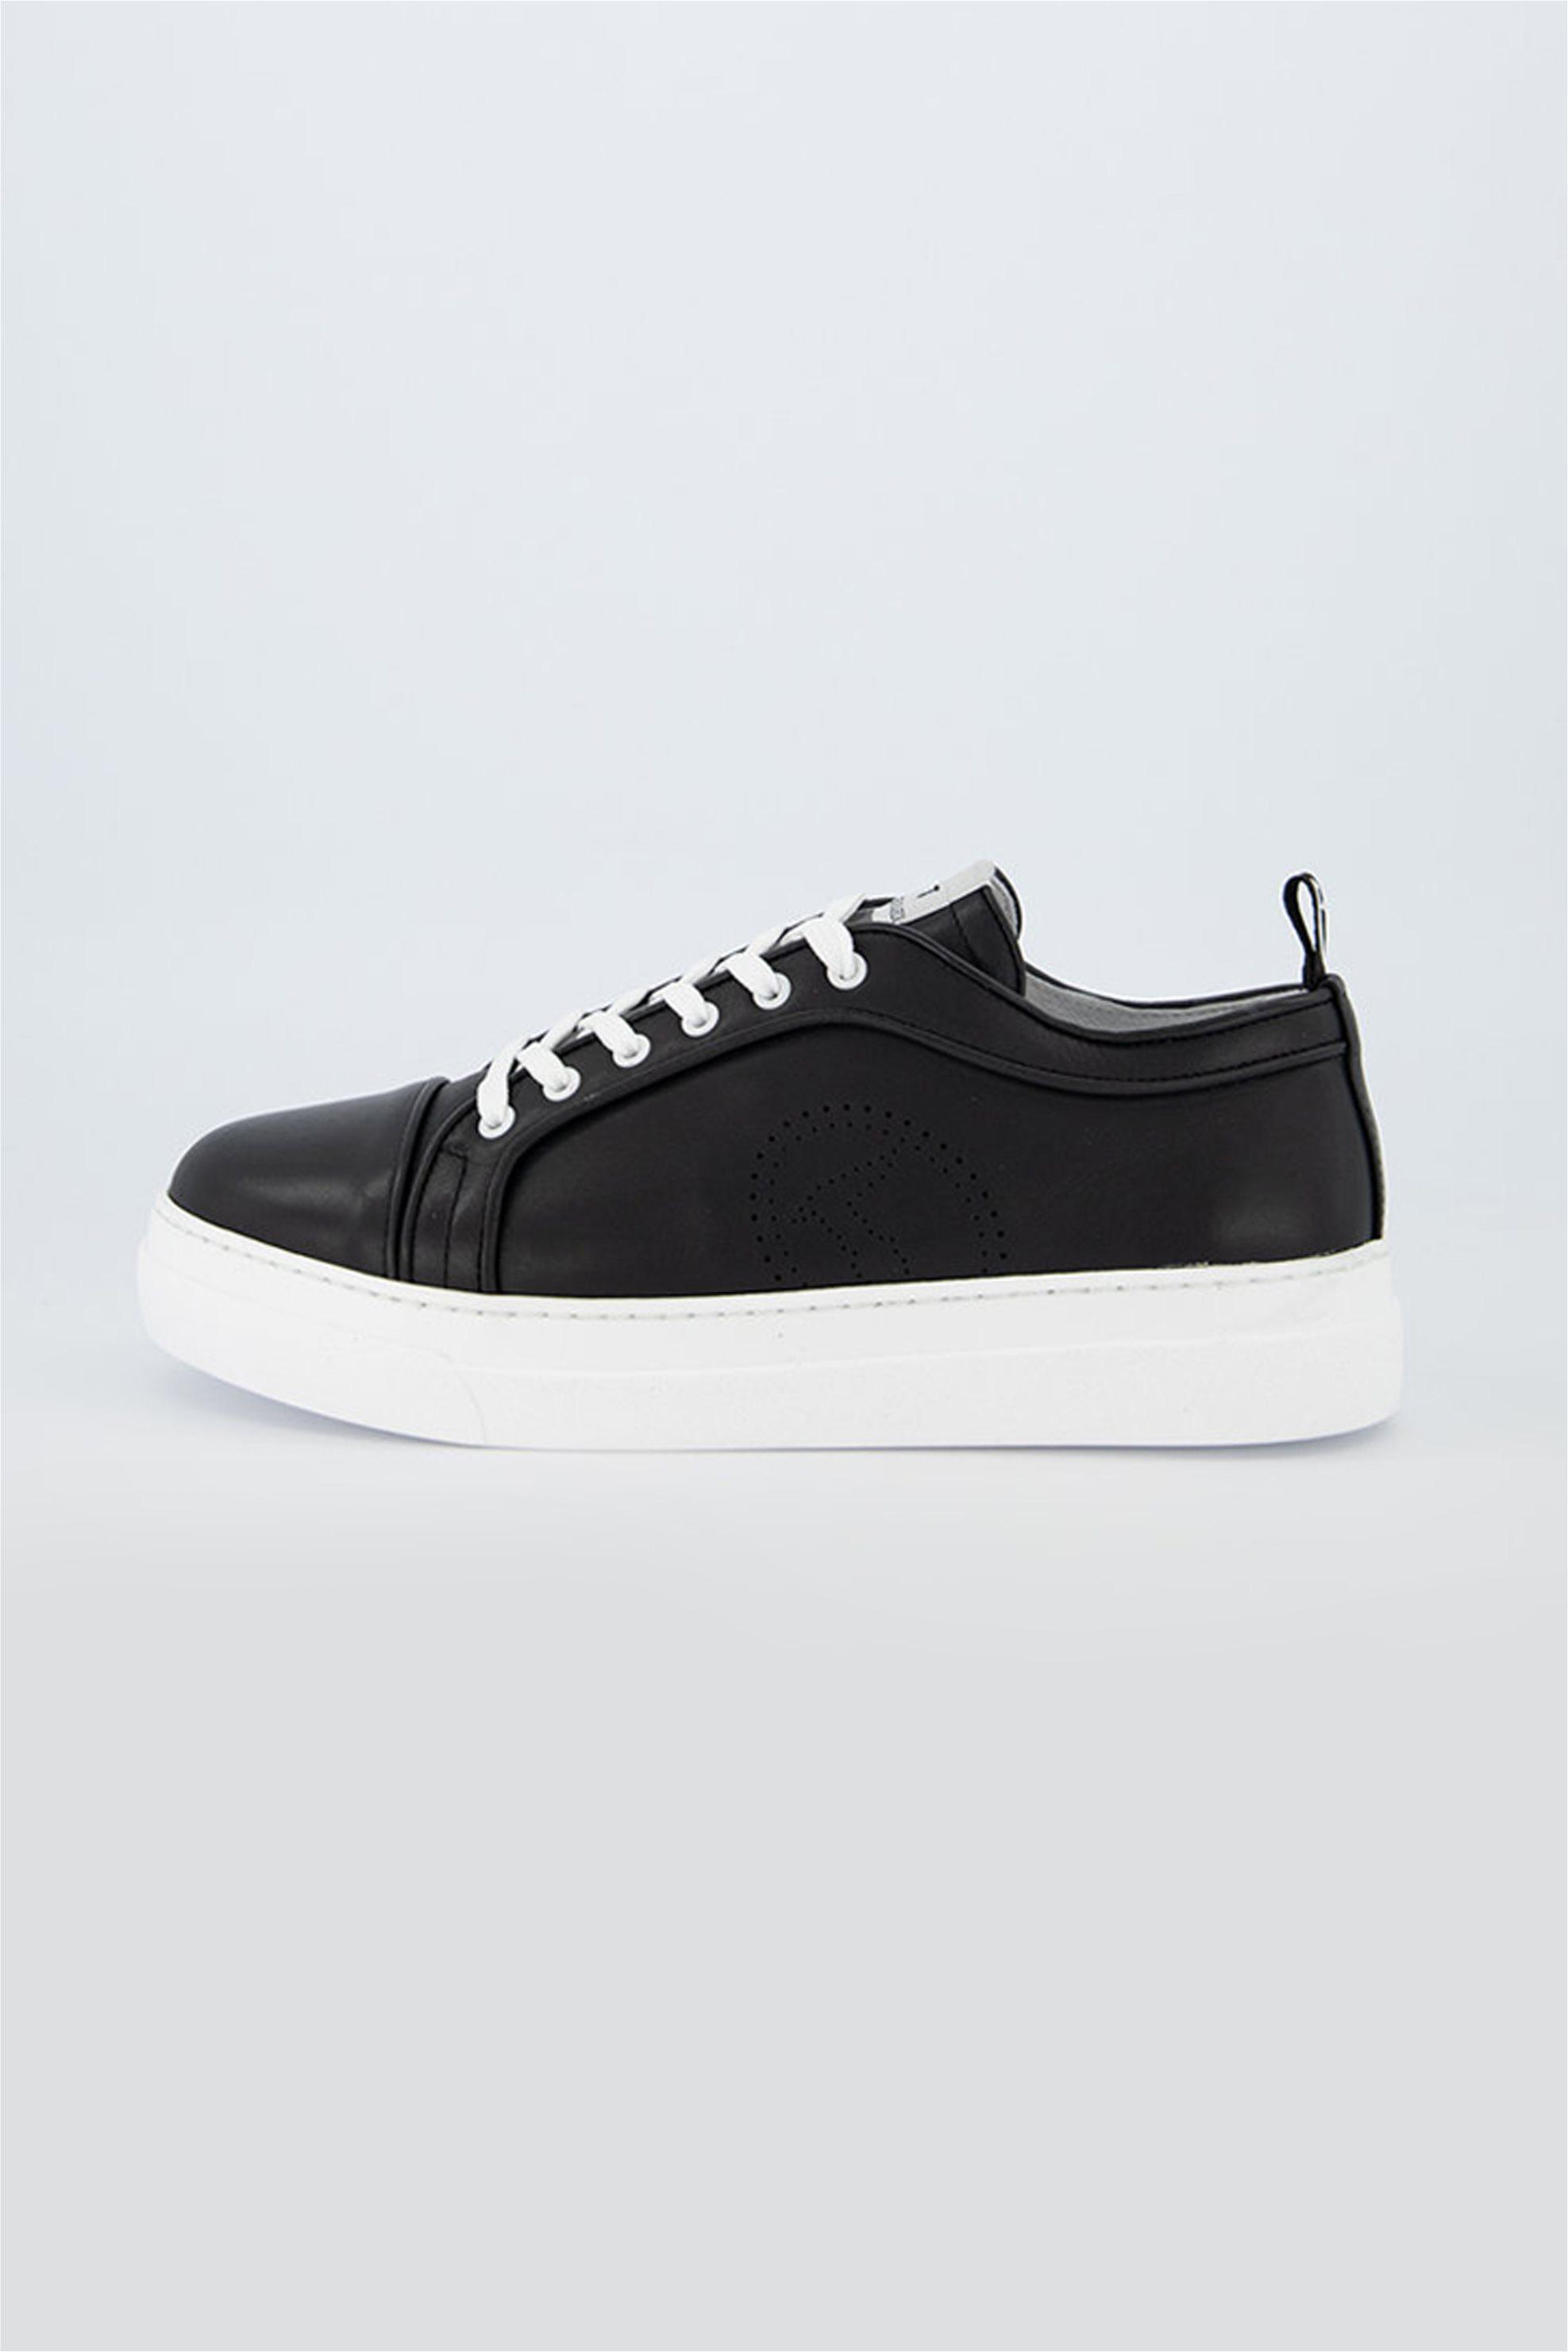 Trussardi ανδρικά sneakers με διάτρητο λογότυπο – 77A00296-9Y099999 – Μαύρο